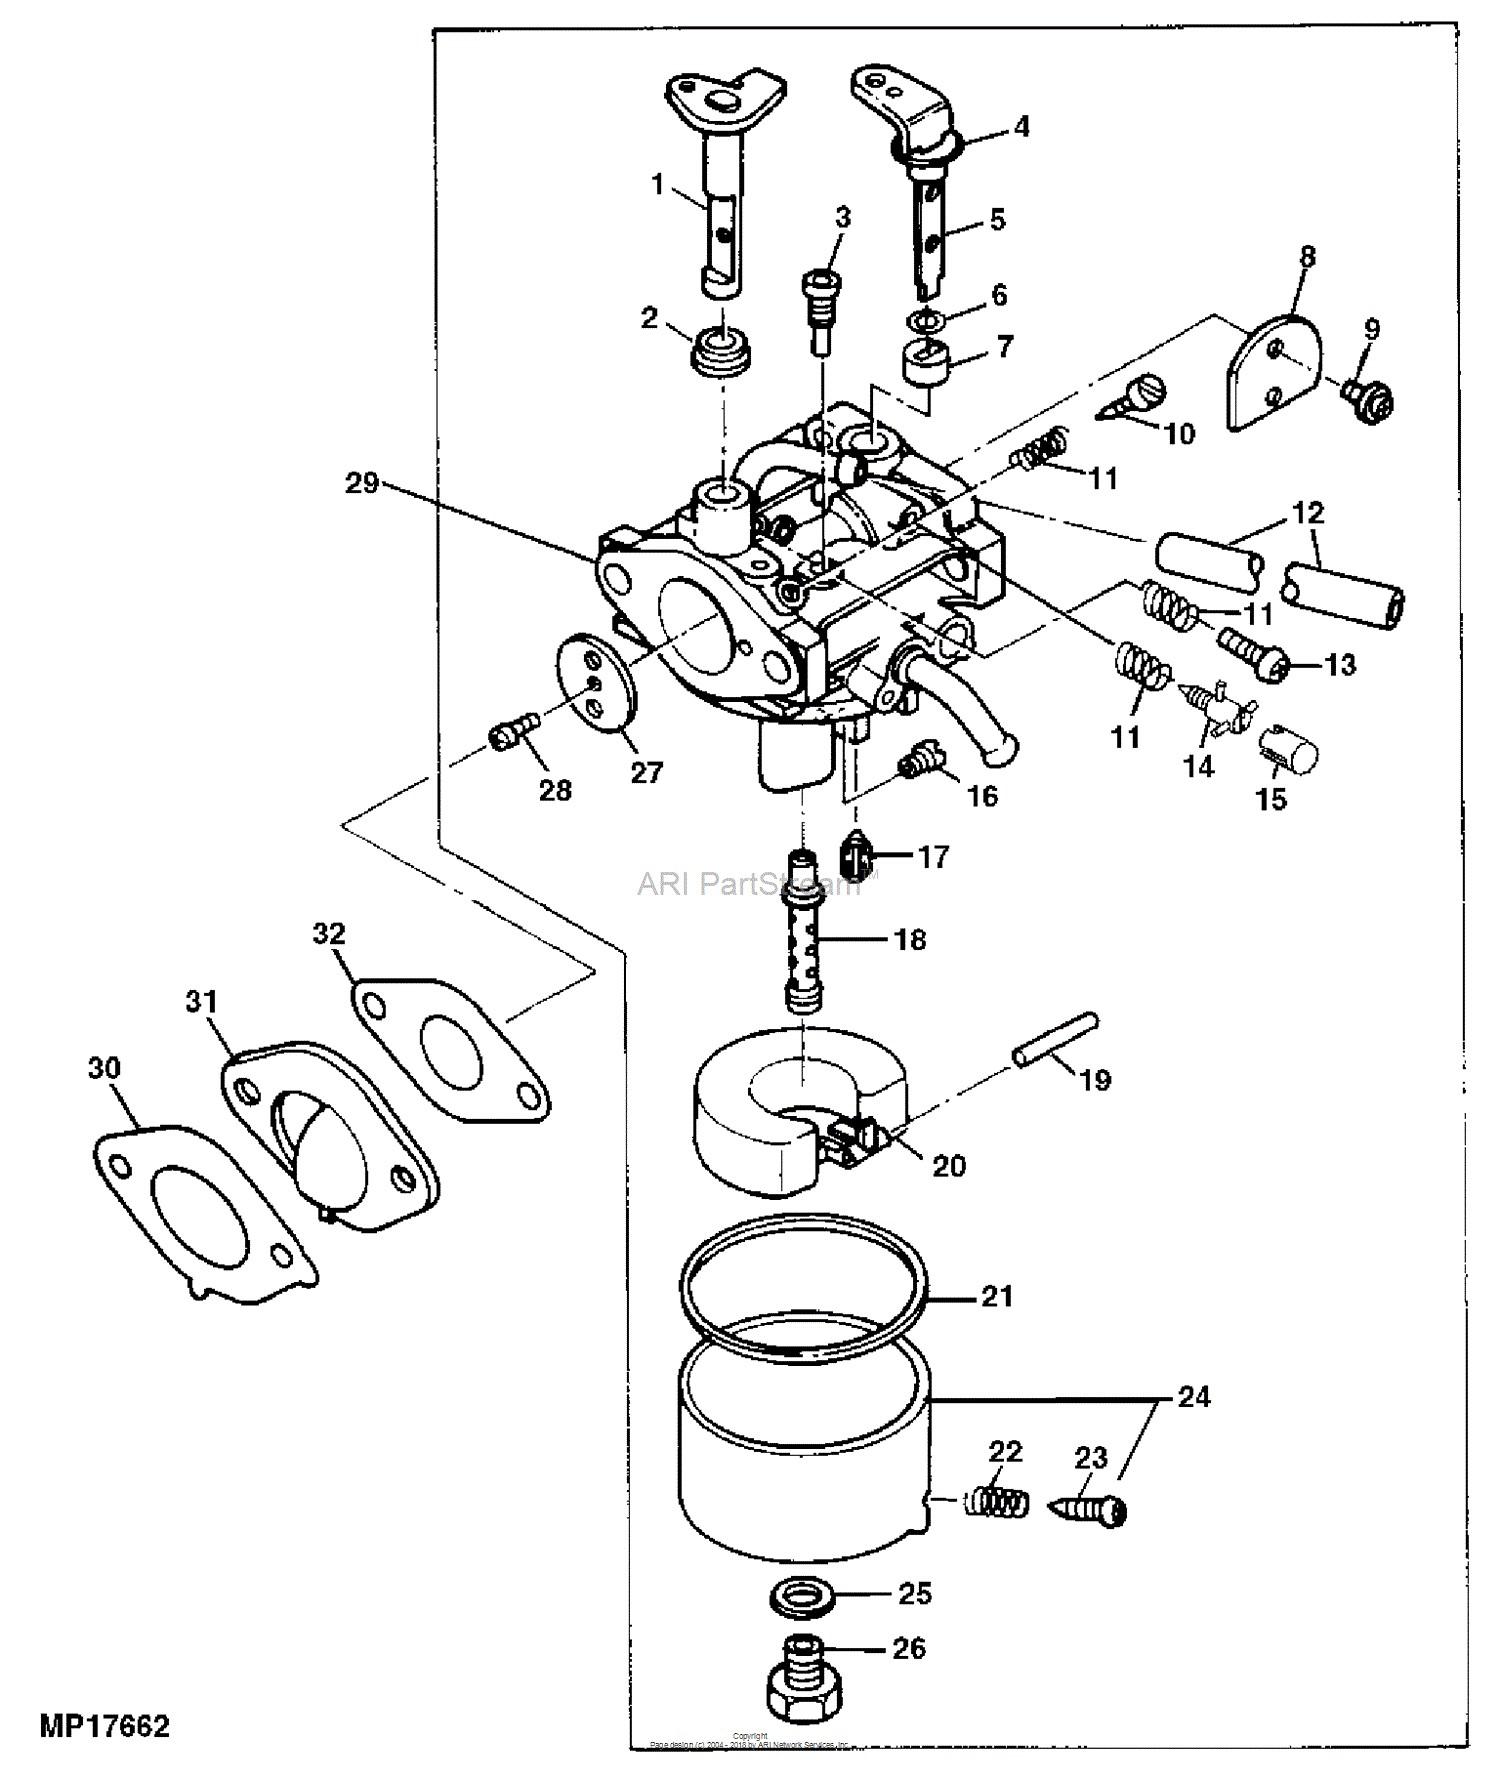 John Deere Gator Engine Parts Diagram John Deere Jx75 Parts Best Deer S Water Alliance org